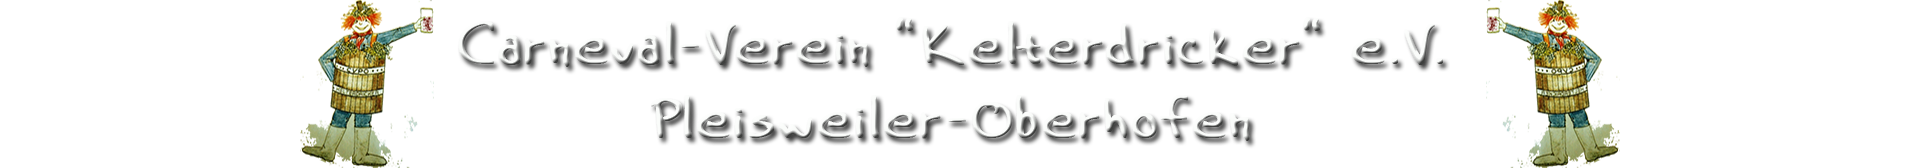 Kelterdricker e.V.